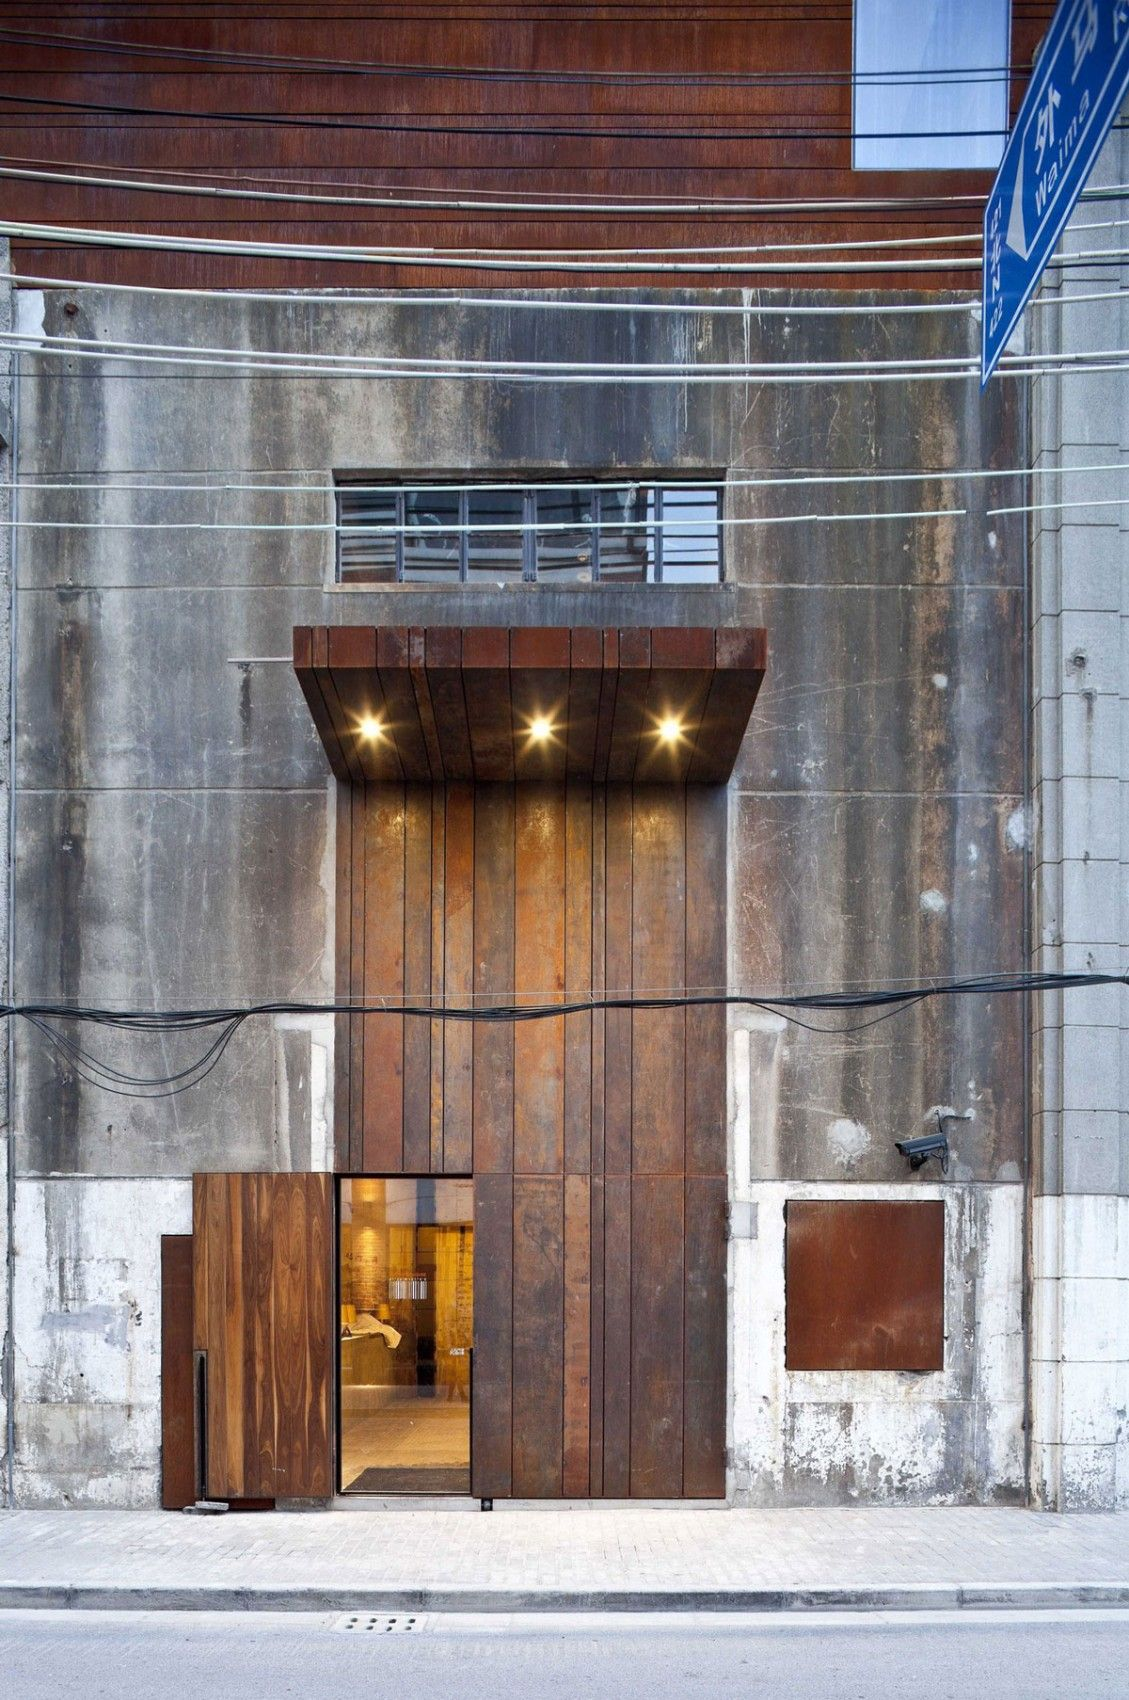 The Waterhouse at South Bund by Neri & Hu